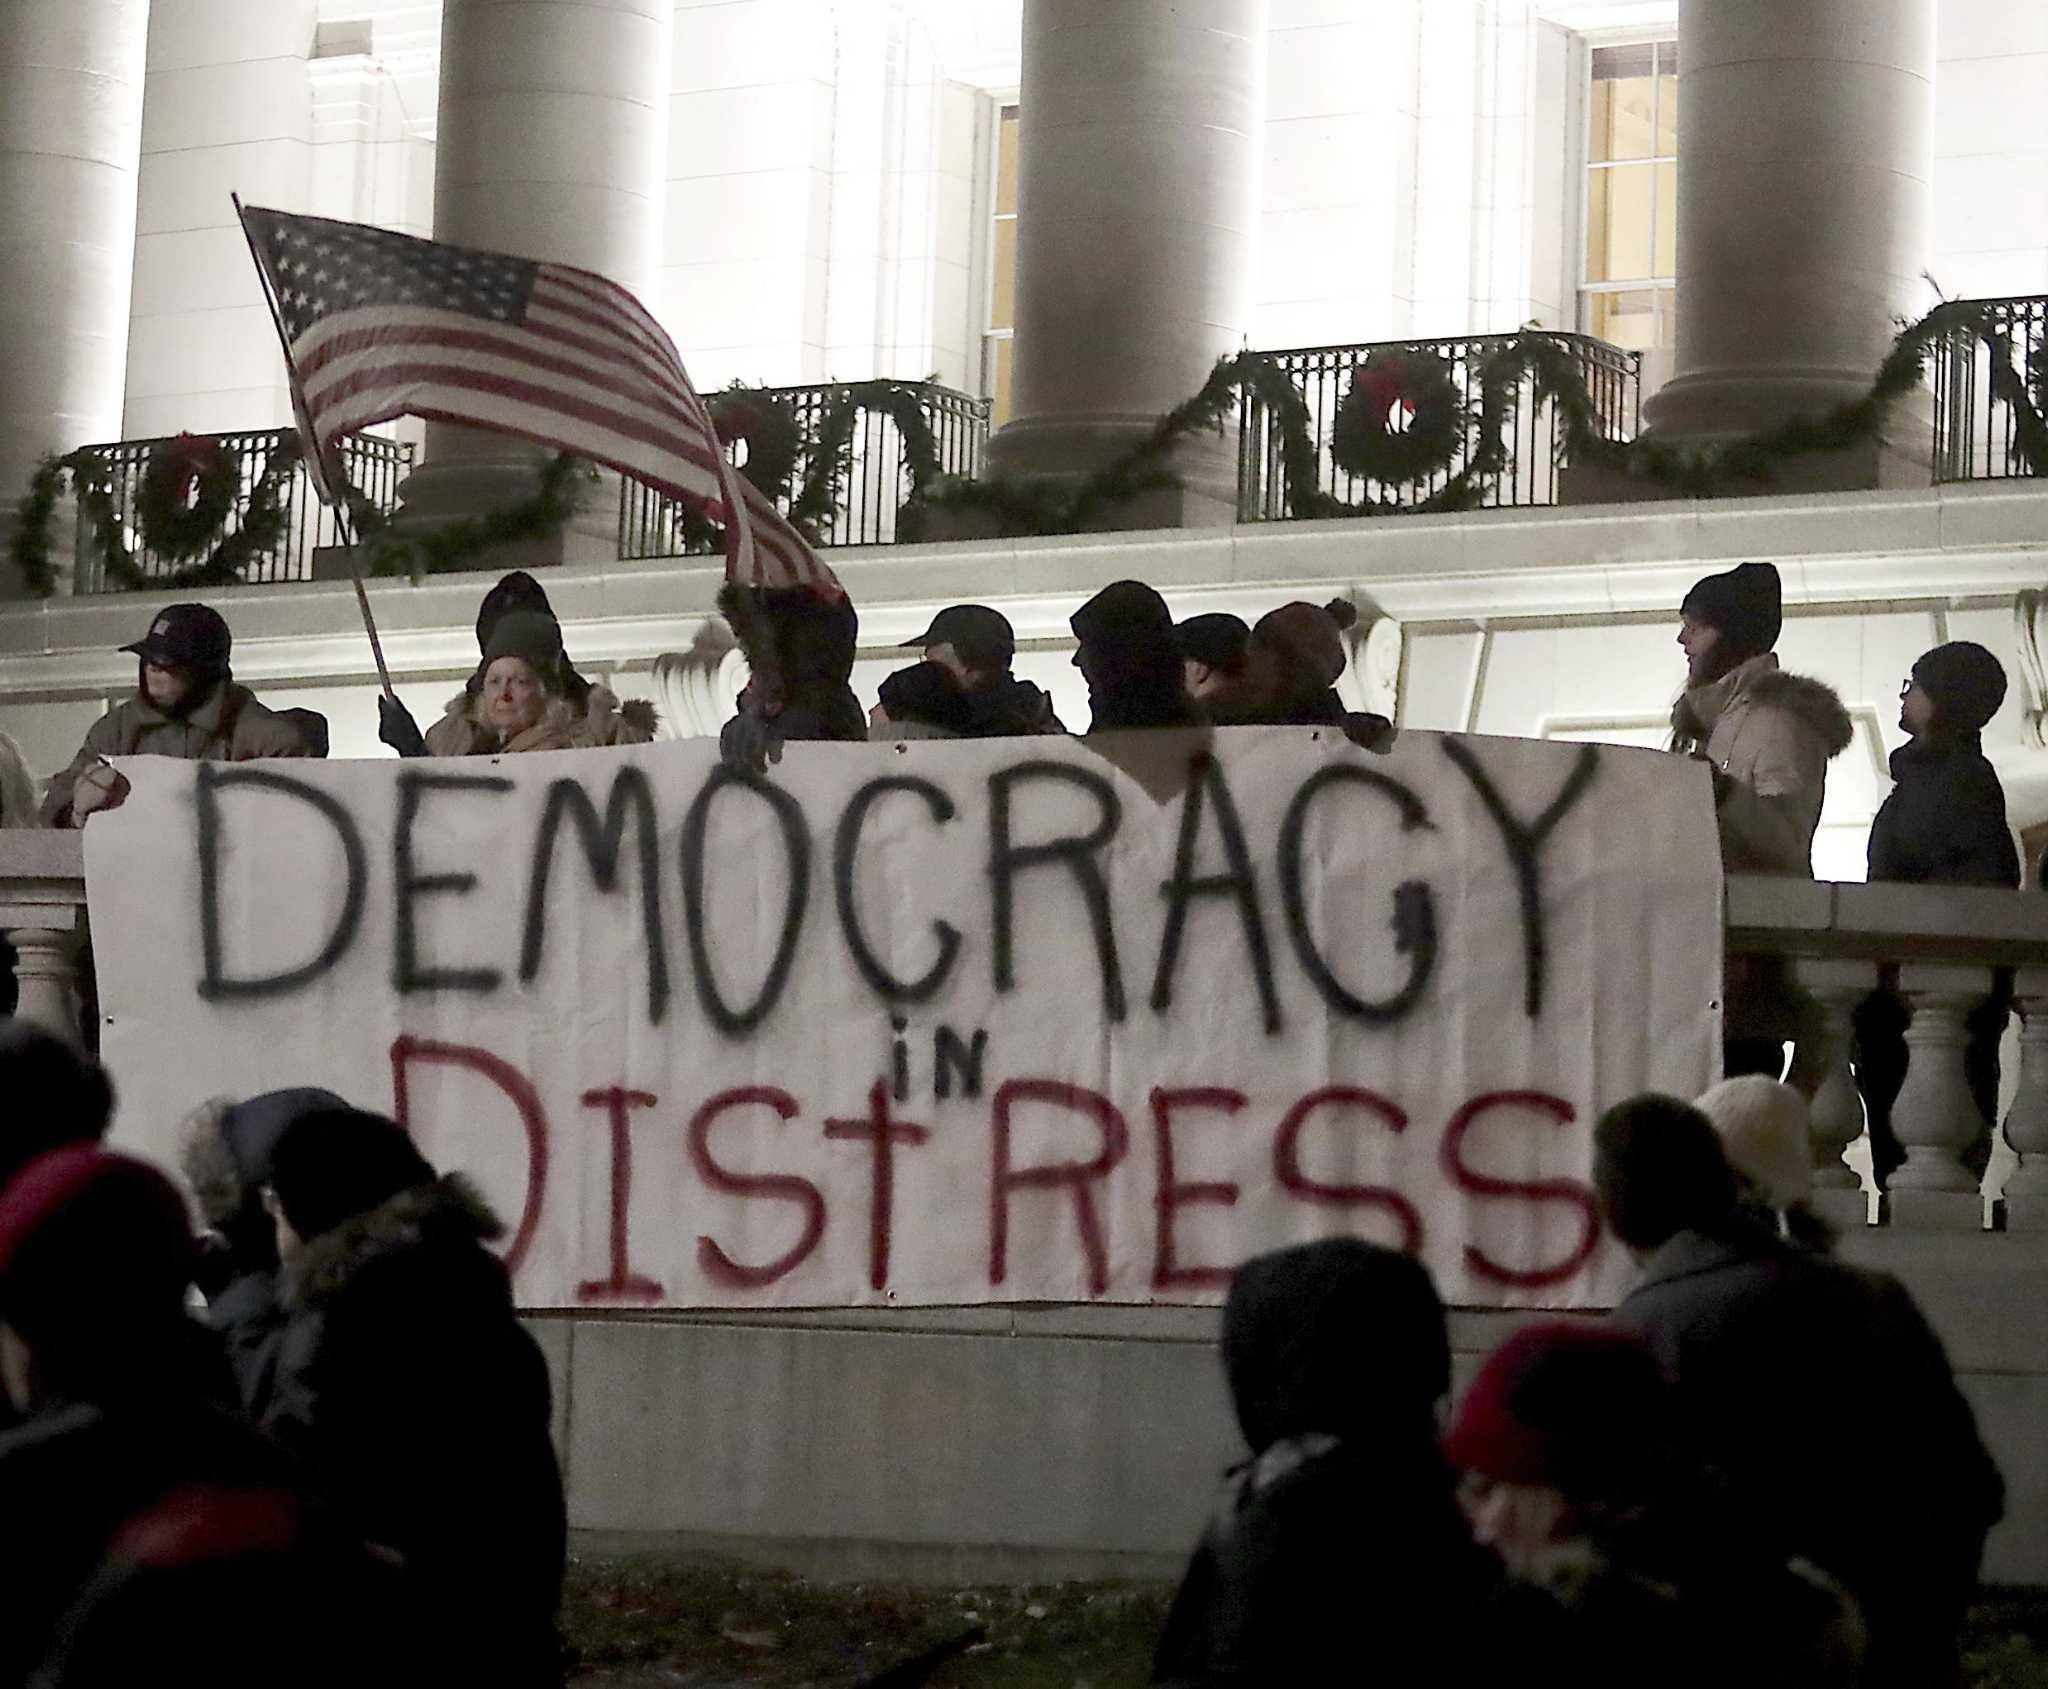 Republican sore losers are a danger to democracy [Opinion]